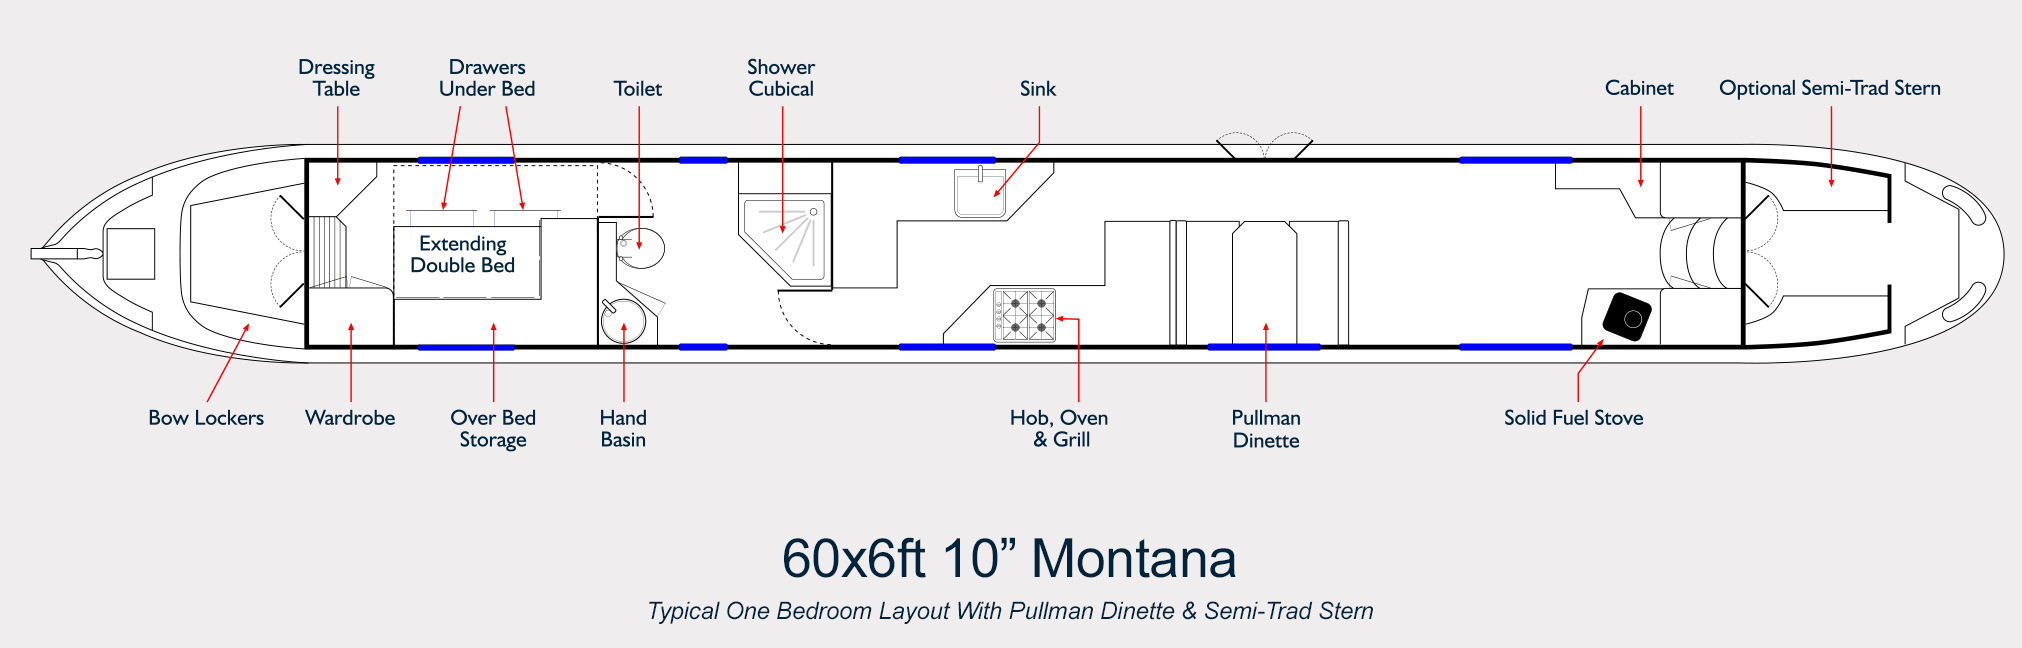 Aqualine Narrowboat Builders Layout Drawing Montana